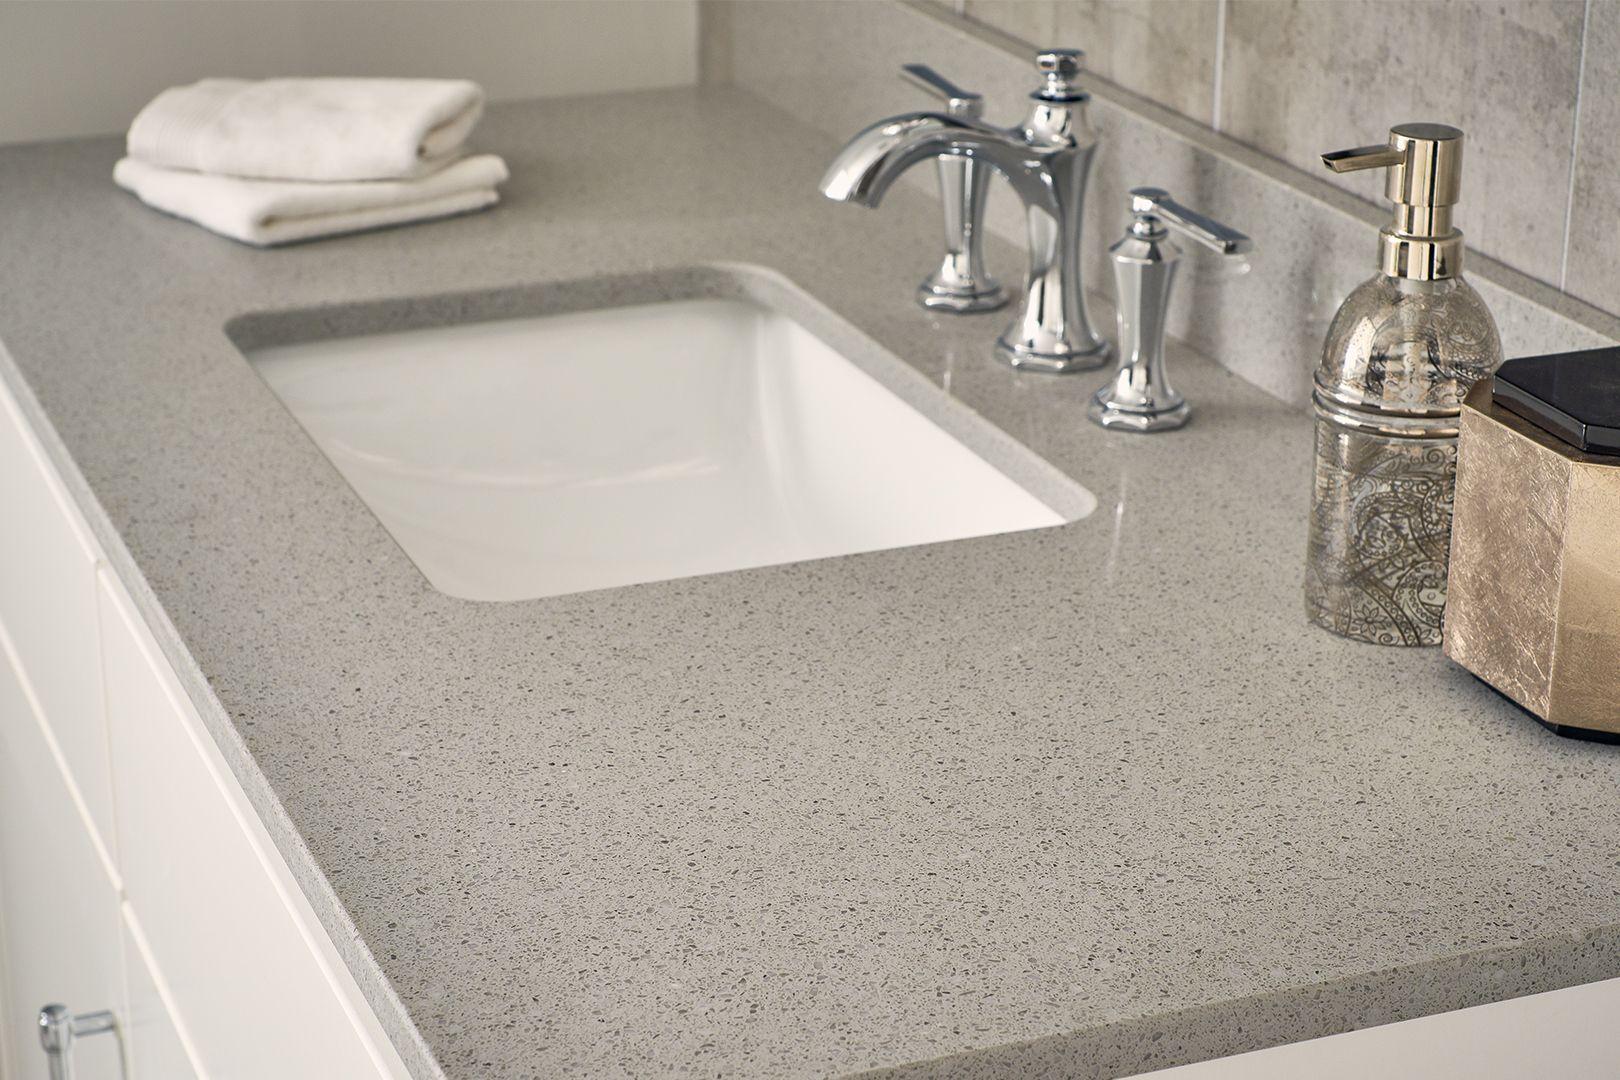 Wolf Quartz Bathroom Vanity Tops Wolf Home Products Quartz Bathroom Vanity Tops Bathroom Vanity Tops Vanity